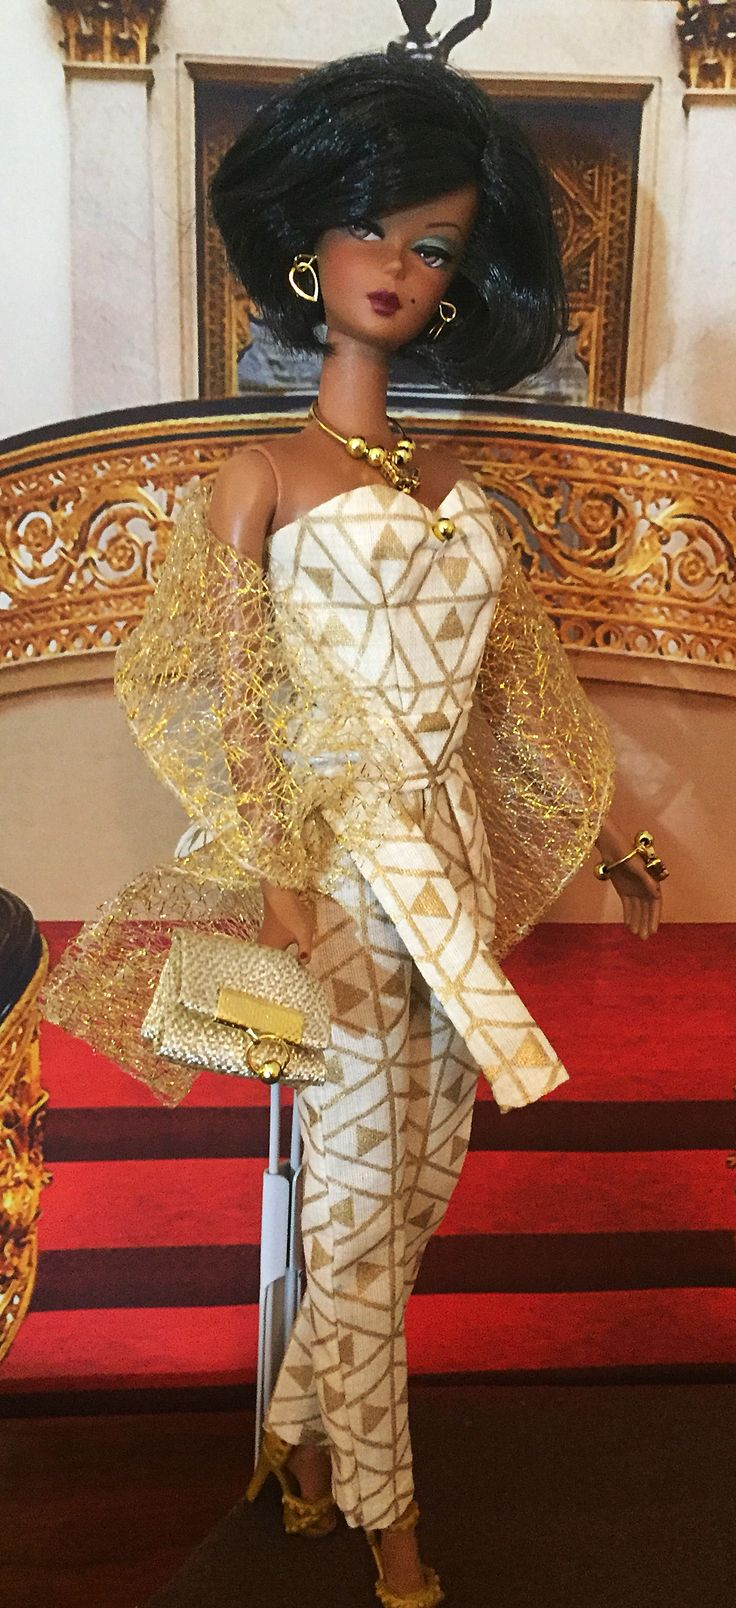 Silkstone barbie Gold jumper handmade